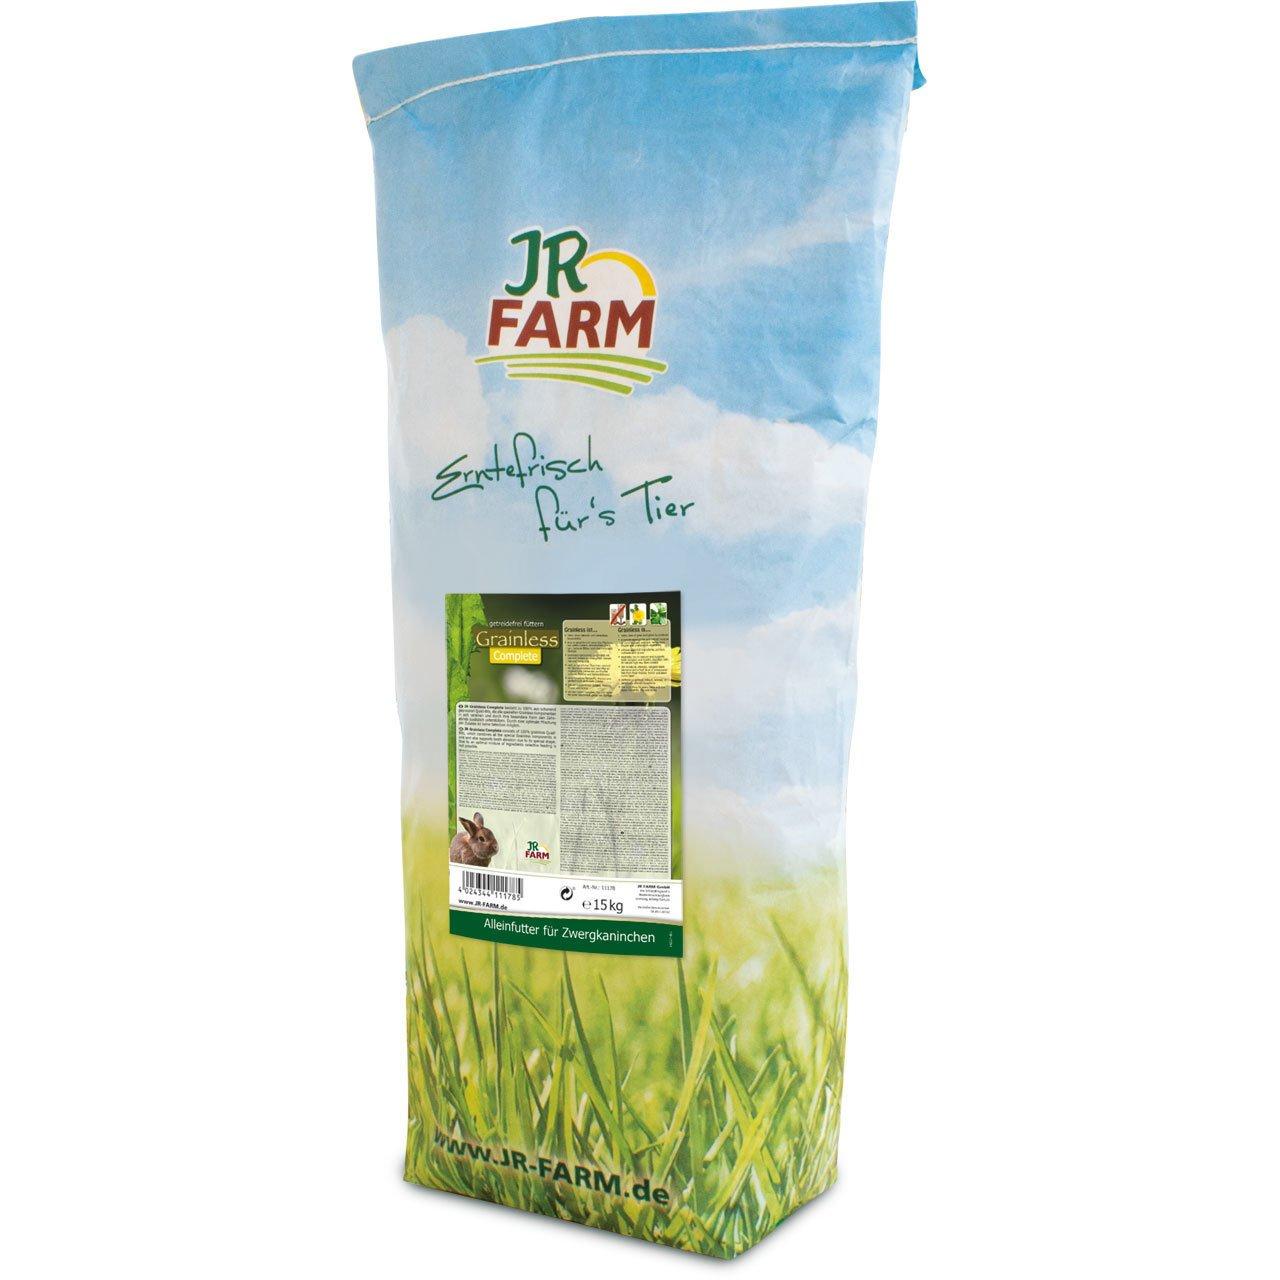 JR Farm Zwergkaninchen Futter Grainless Complete, Bild 4